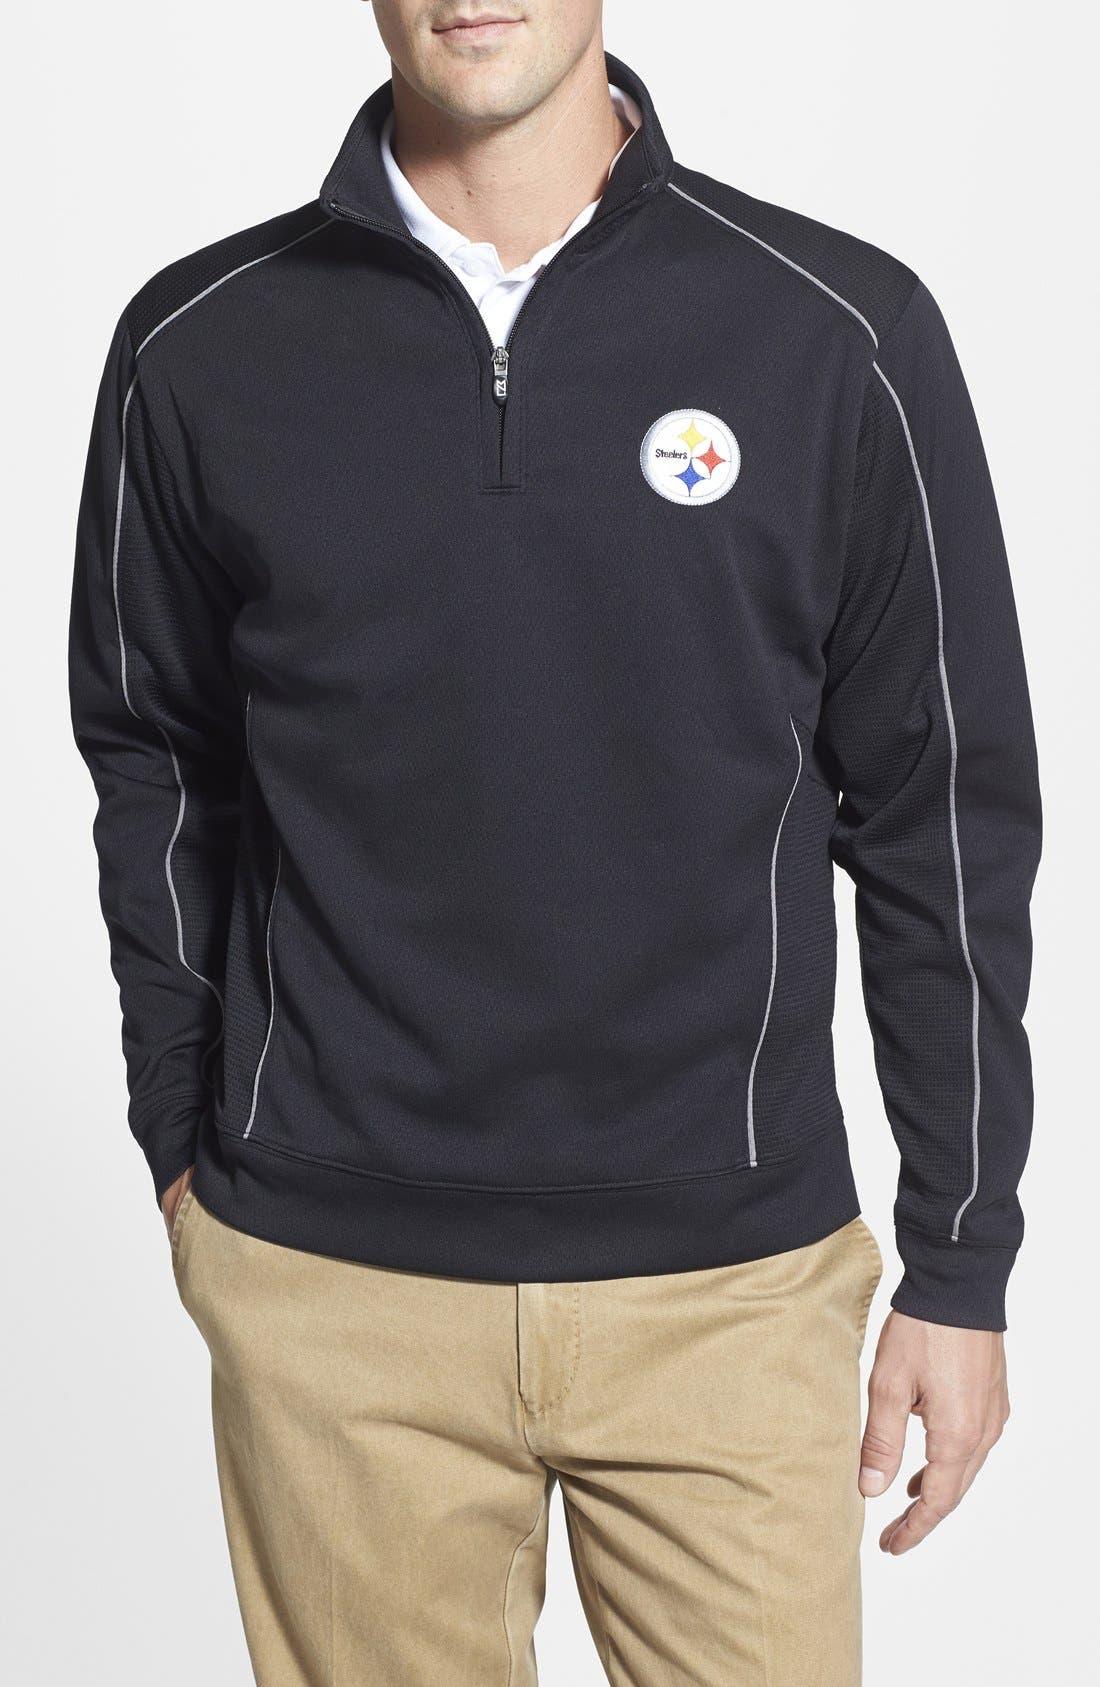 'Pittsburgh Steelers - Edge' DryTec Moisture Wicking Half Zip Pullover,                         Main,                         color, Black